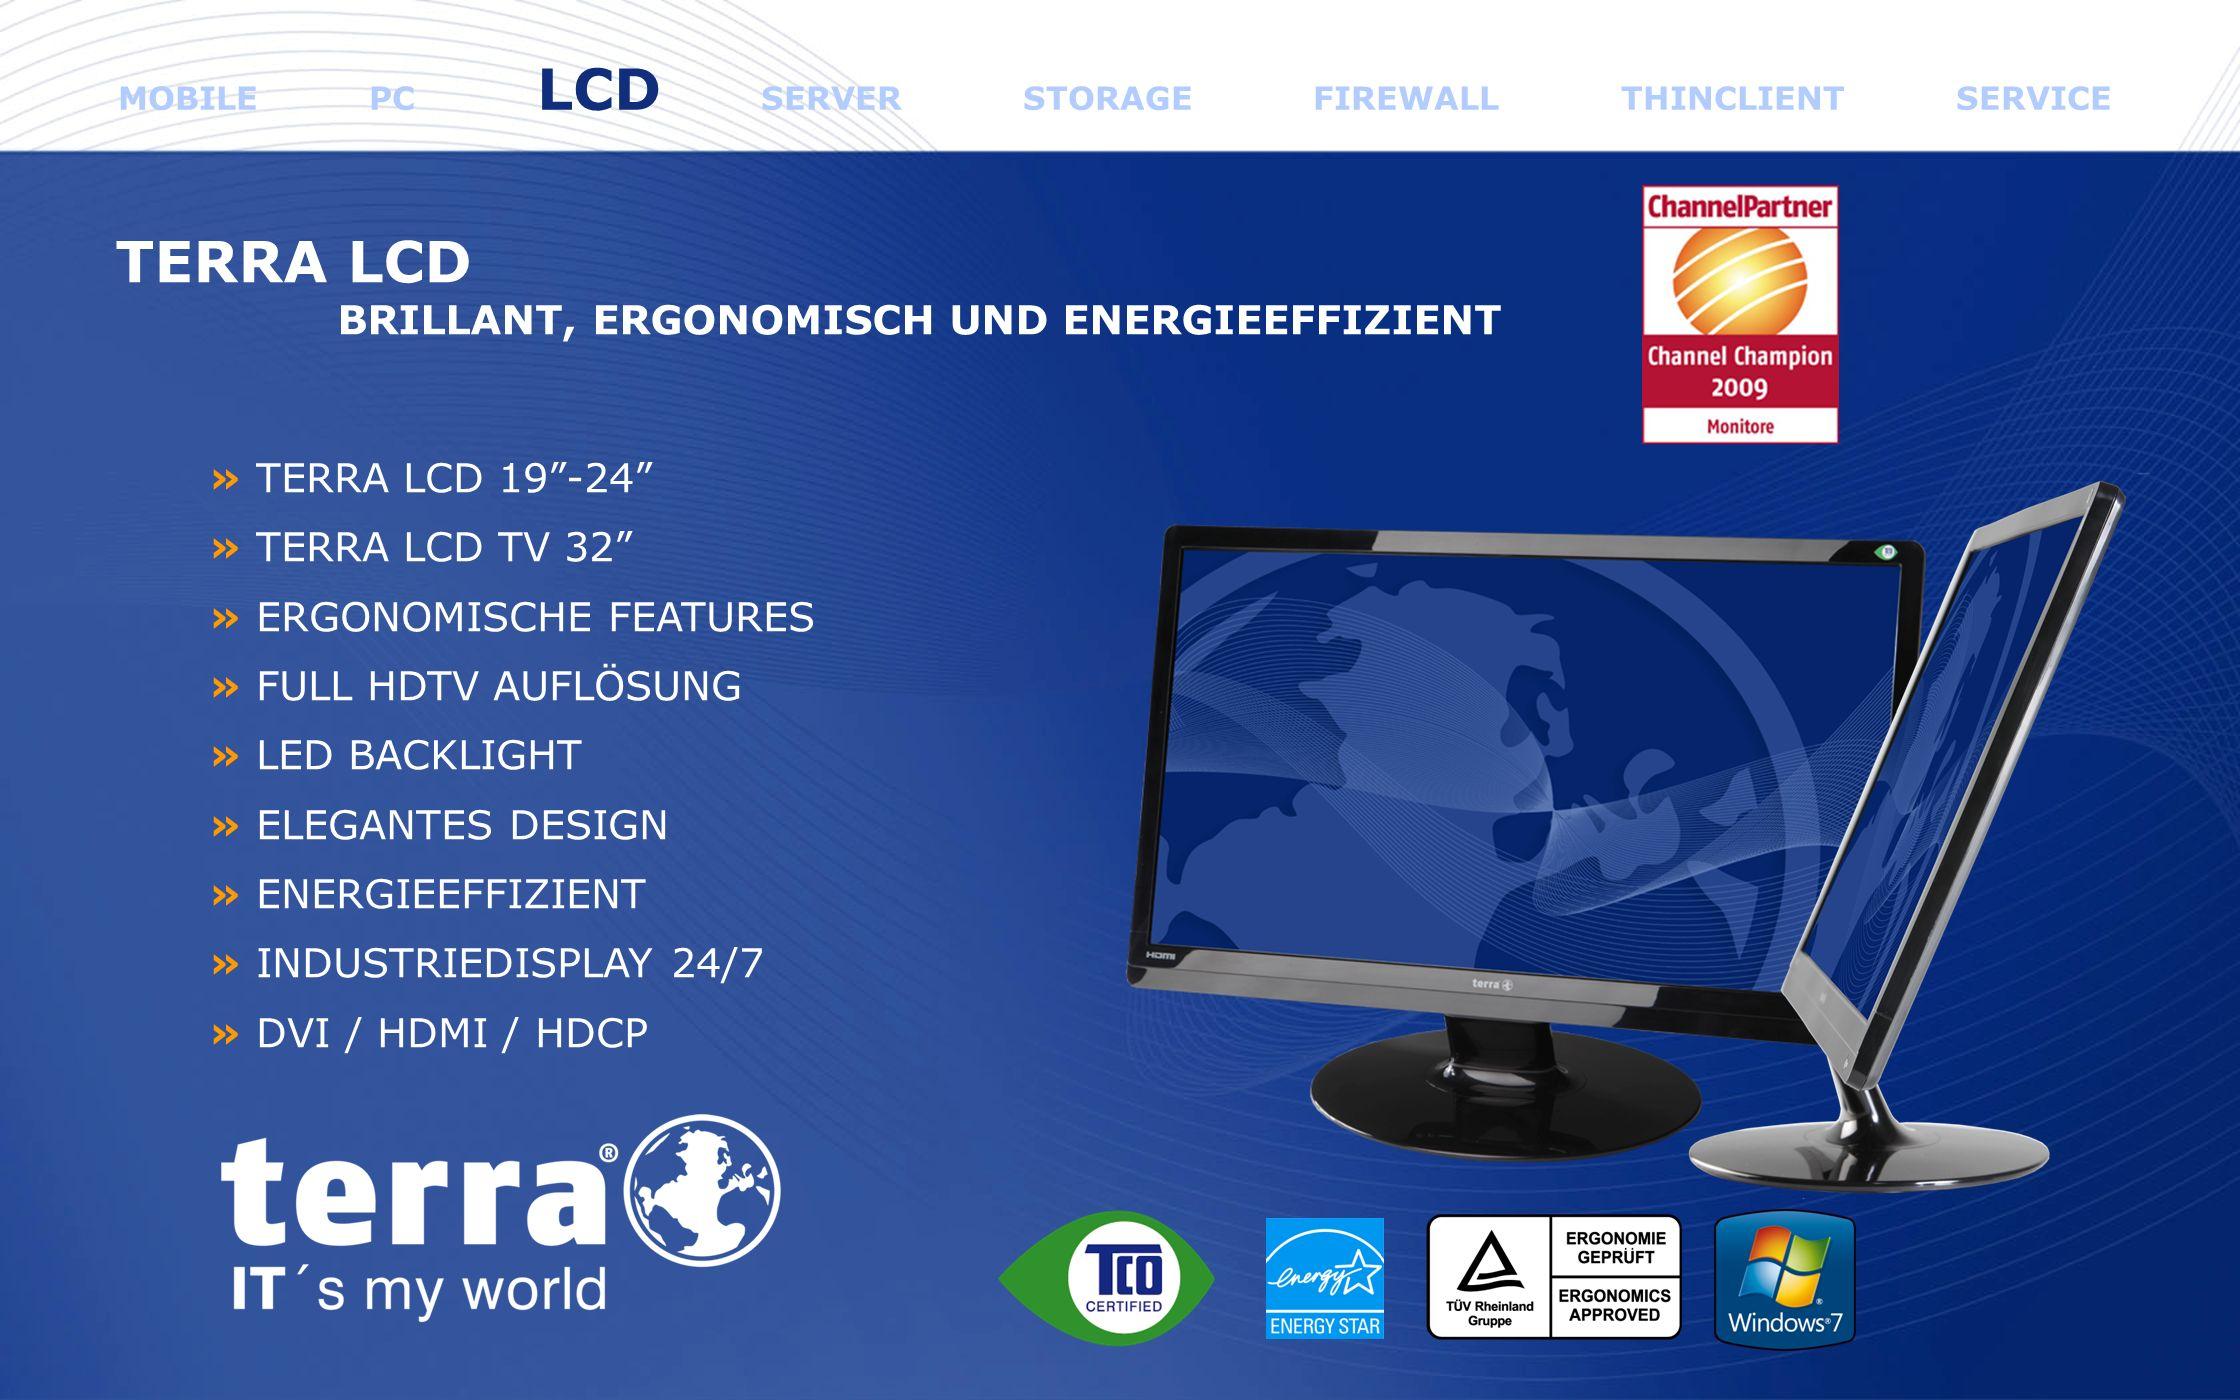 www.wortmann.de » TERRA LCD 19-24 » TERRA LCD TV 32 » ERGONOMISCHE FEATURES » FULL HDTV AUFLÖSUNG » LED BACKLIGHT » ELEGANTES DESIGN » ENERGIEEFFIZIEN